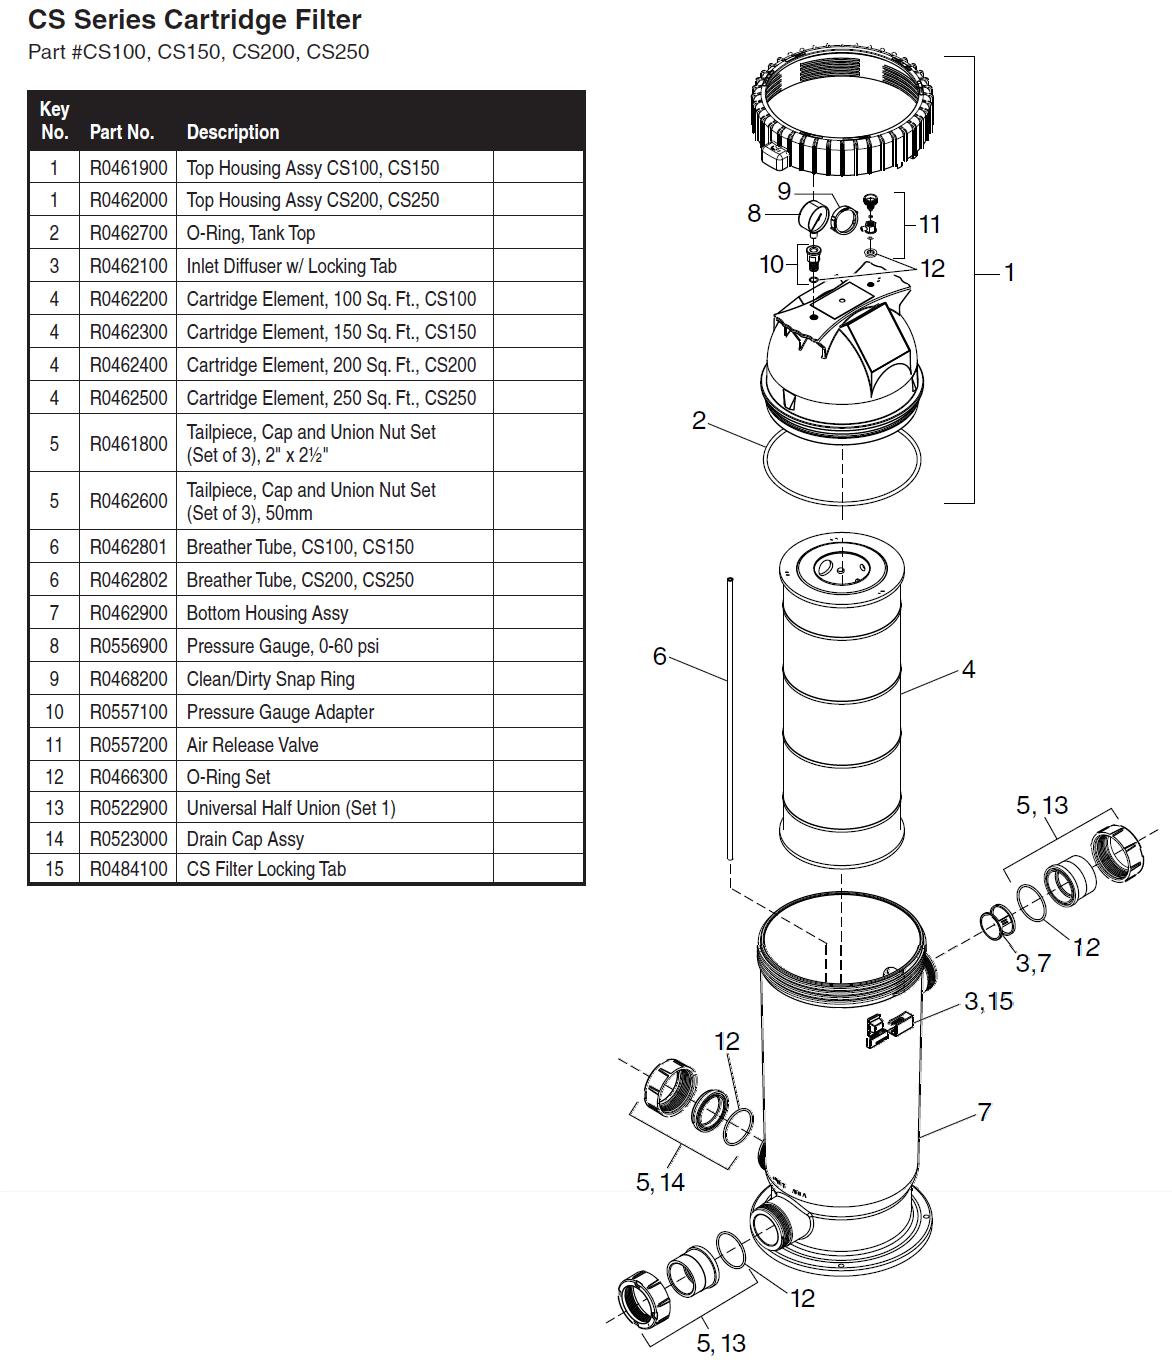 Jandy Cs Series Filter Parts